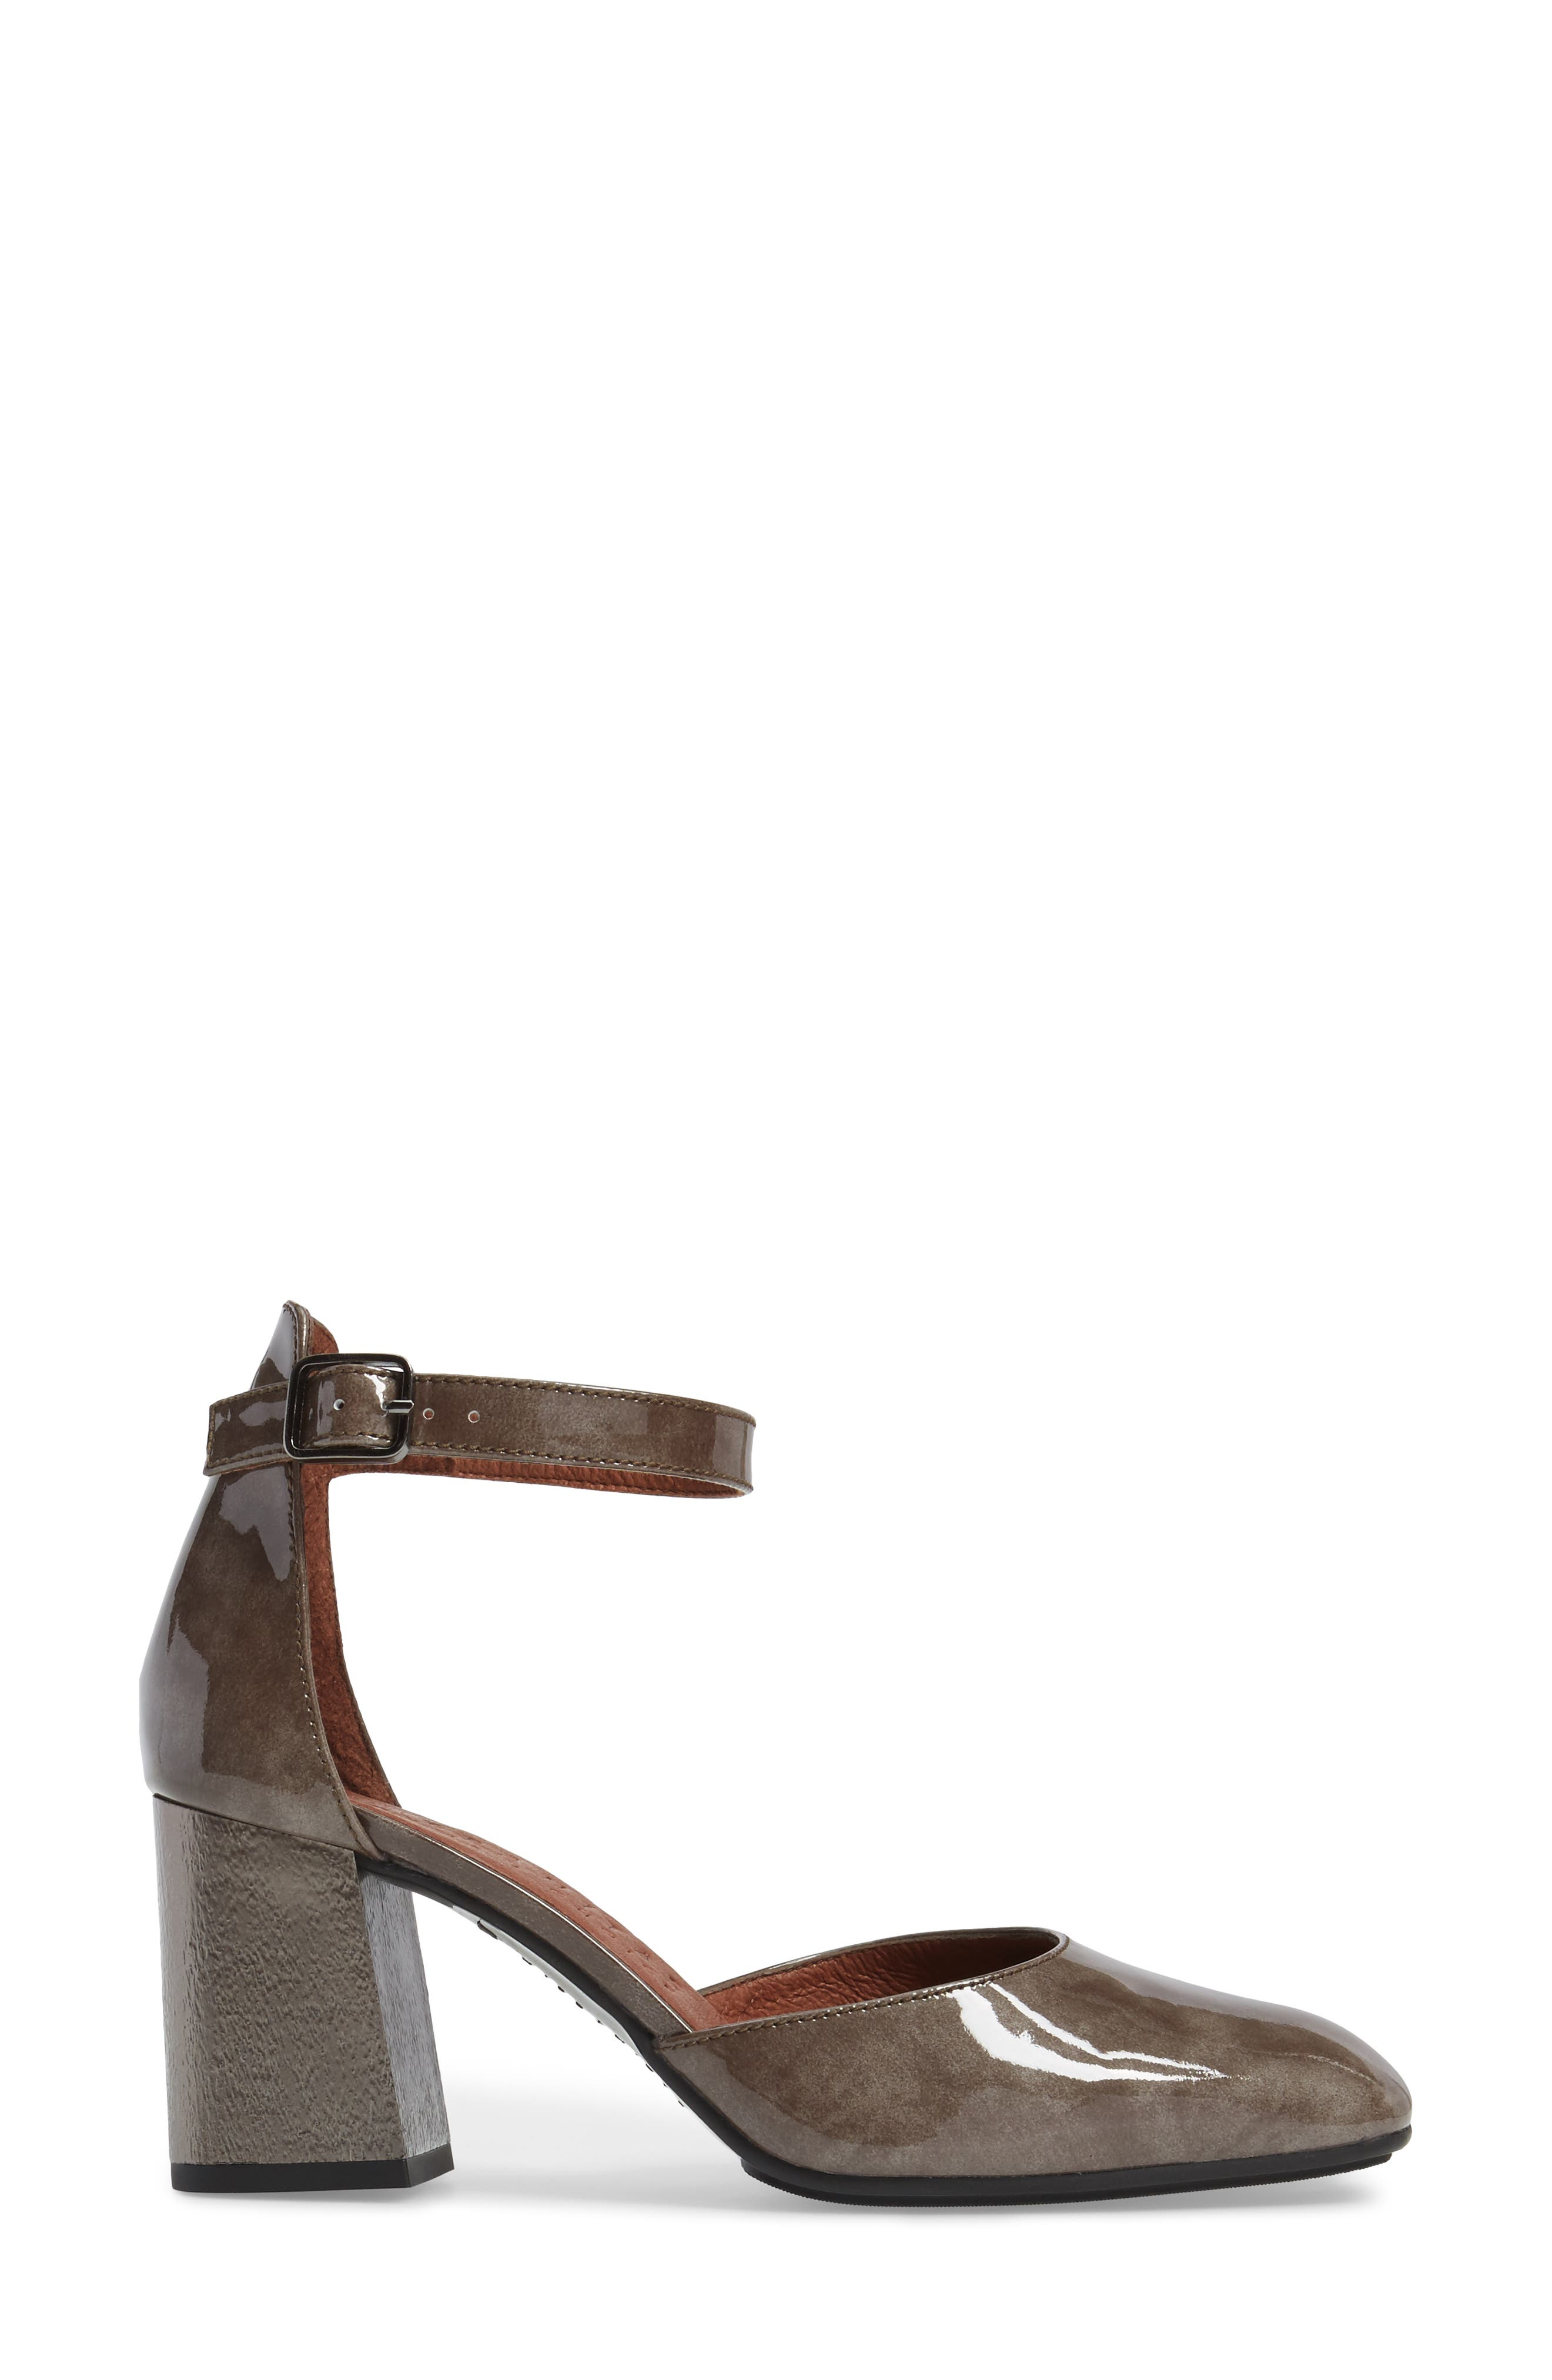 Paulette Flared Heel Pump,                             Alternate thumbnail 3, color,                             Vision Leather